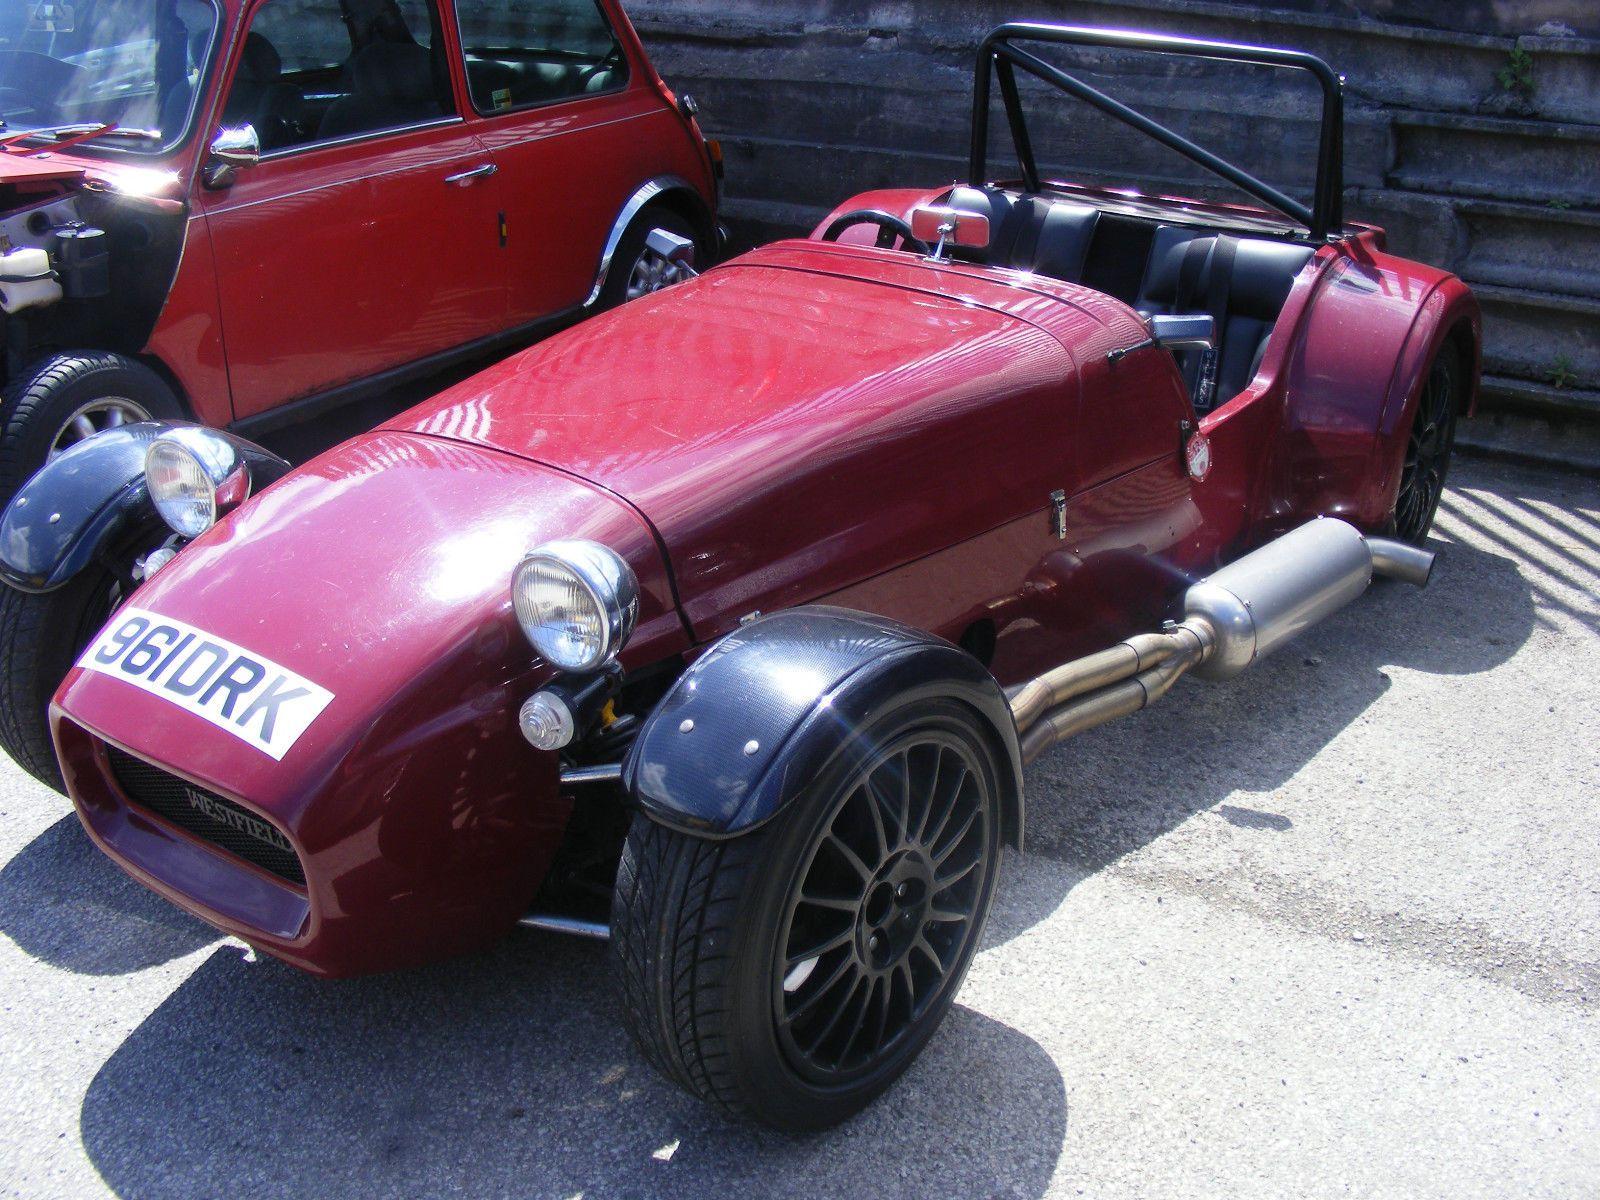 Lotus 7 kit car usa - Westfield Kit Car Se 2 0 16v Xe Not Locost Caterham